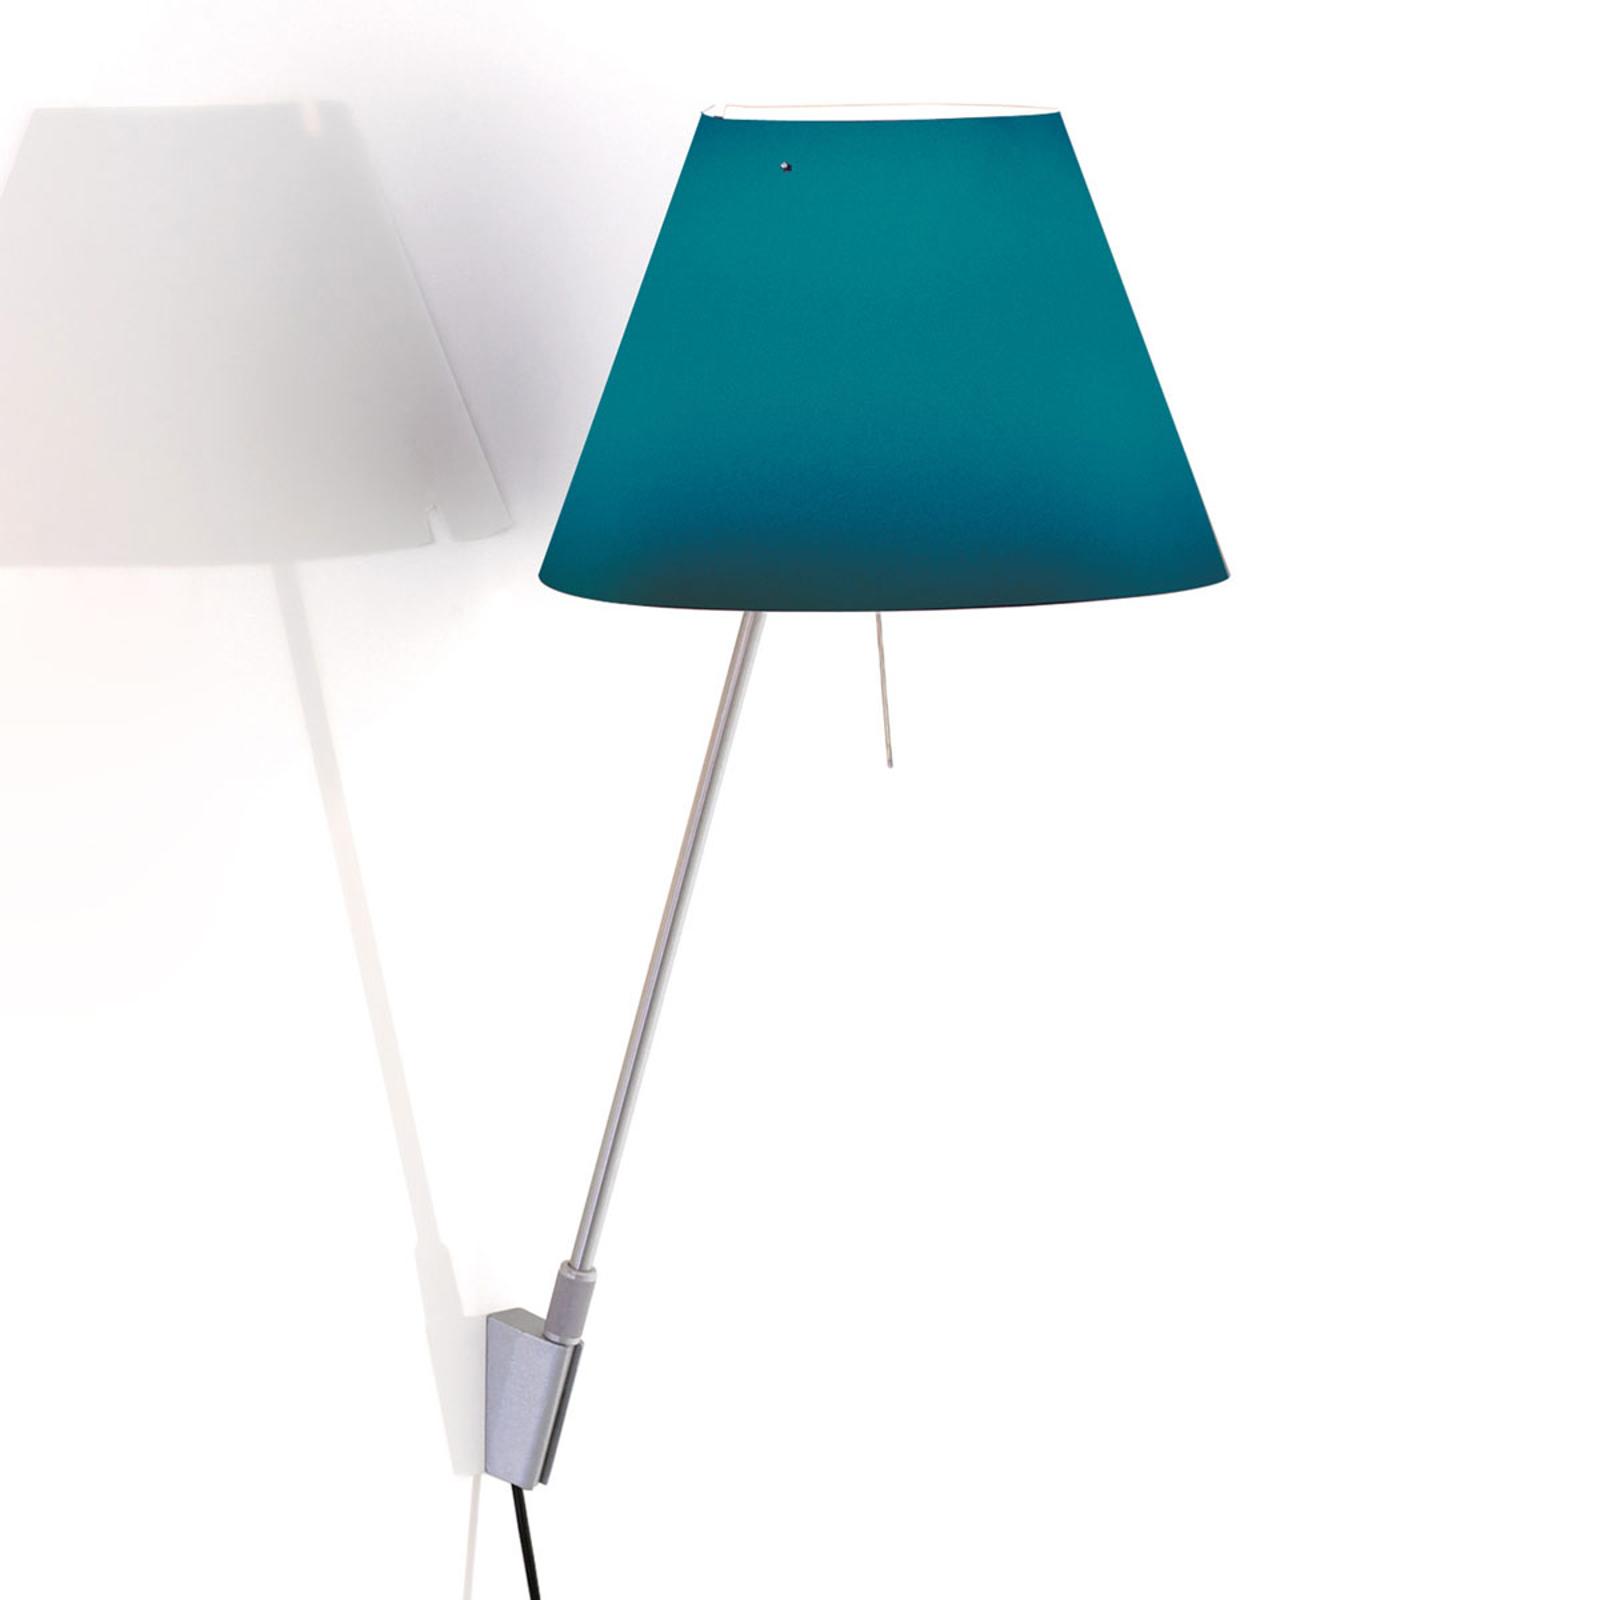 Luceplan Costanzina applique alu, bleu pétrole